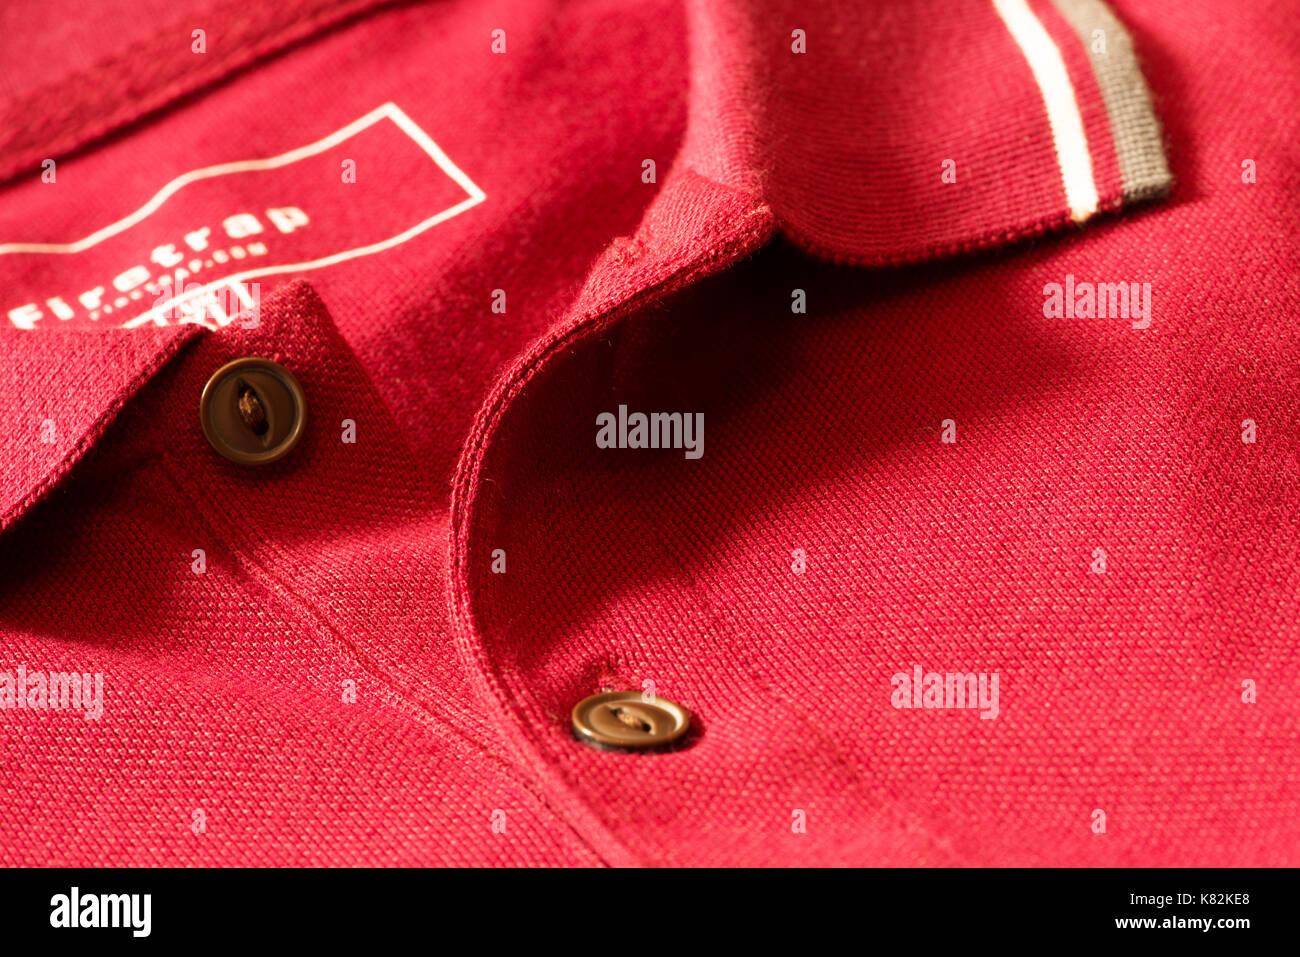 Tee shirt - Stock Image